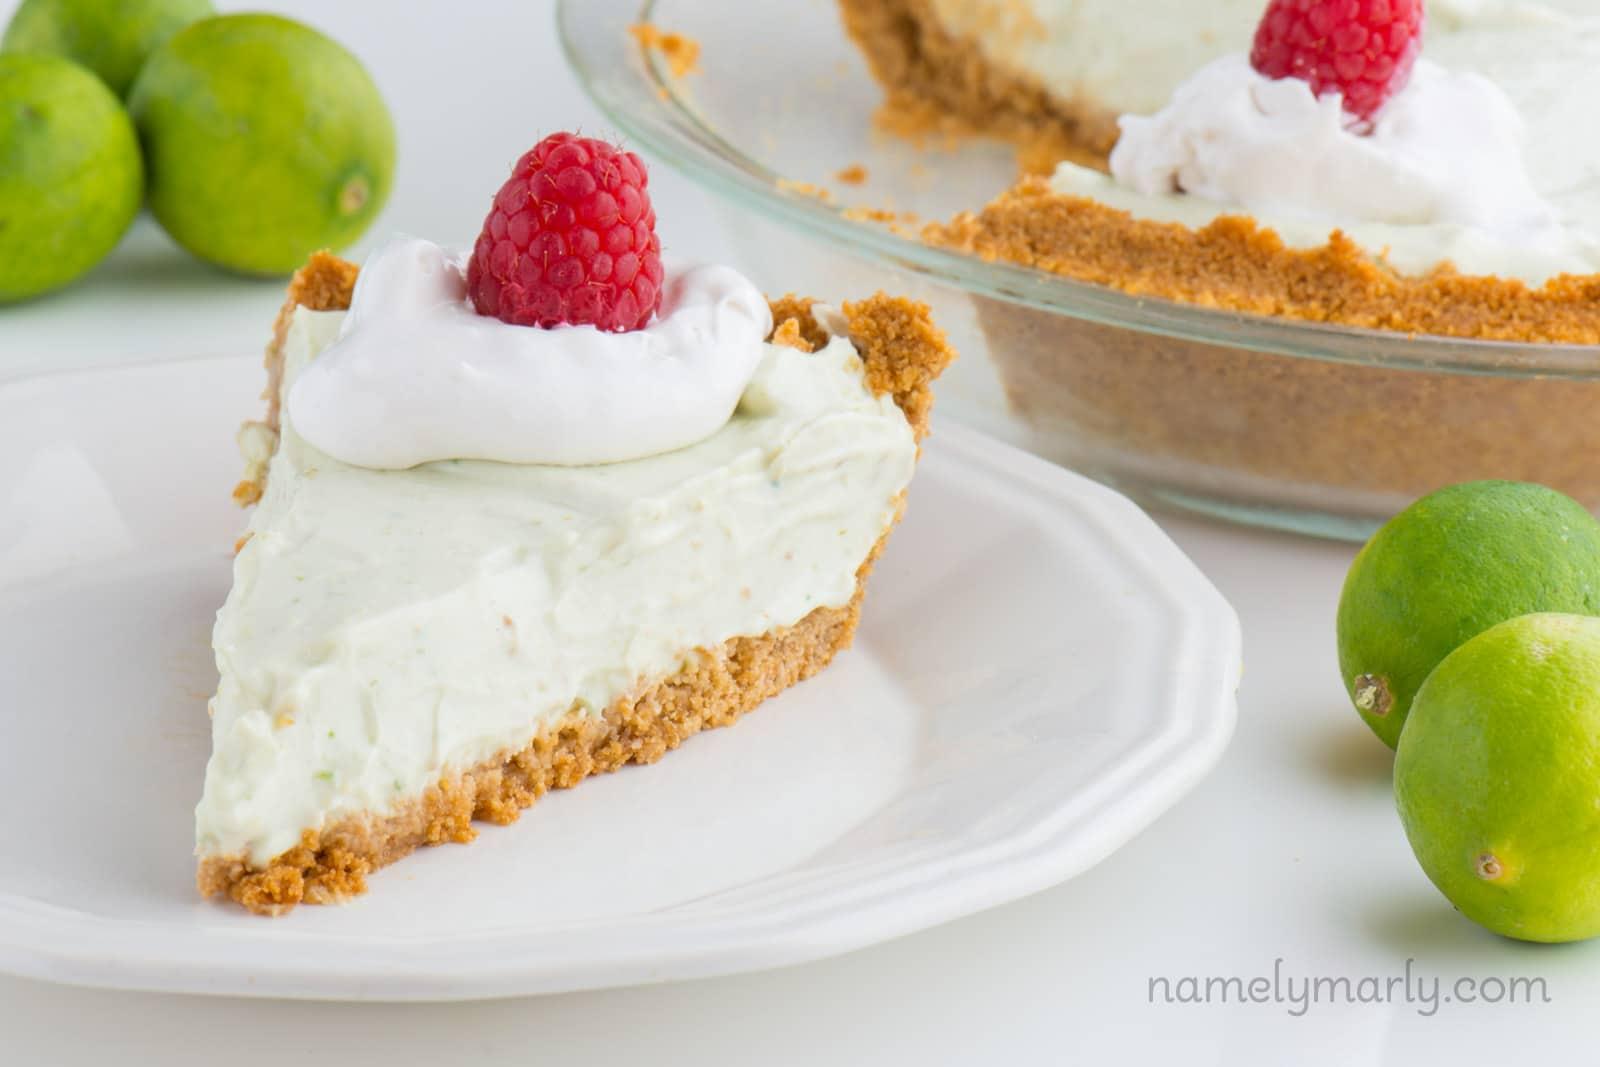 Easy Vegan Key Lime Pie recipe